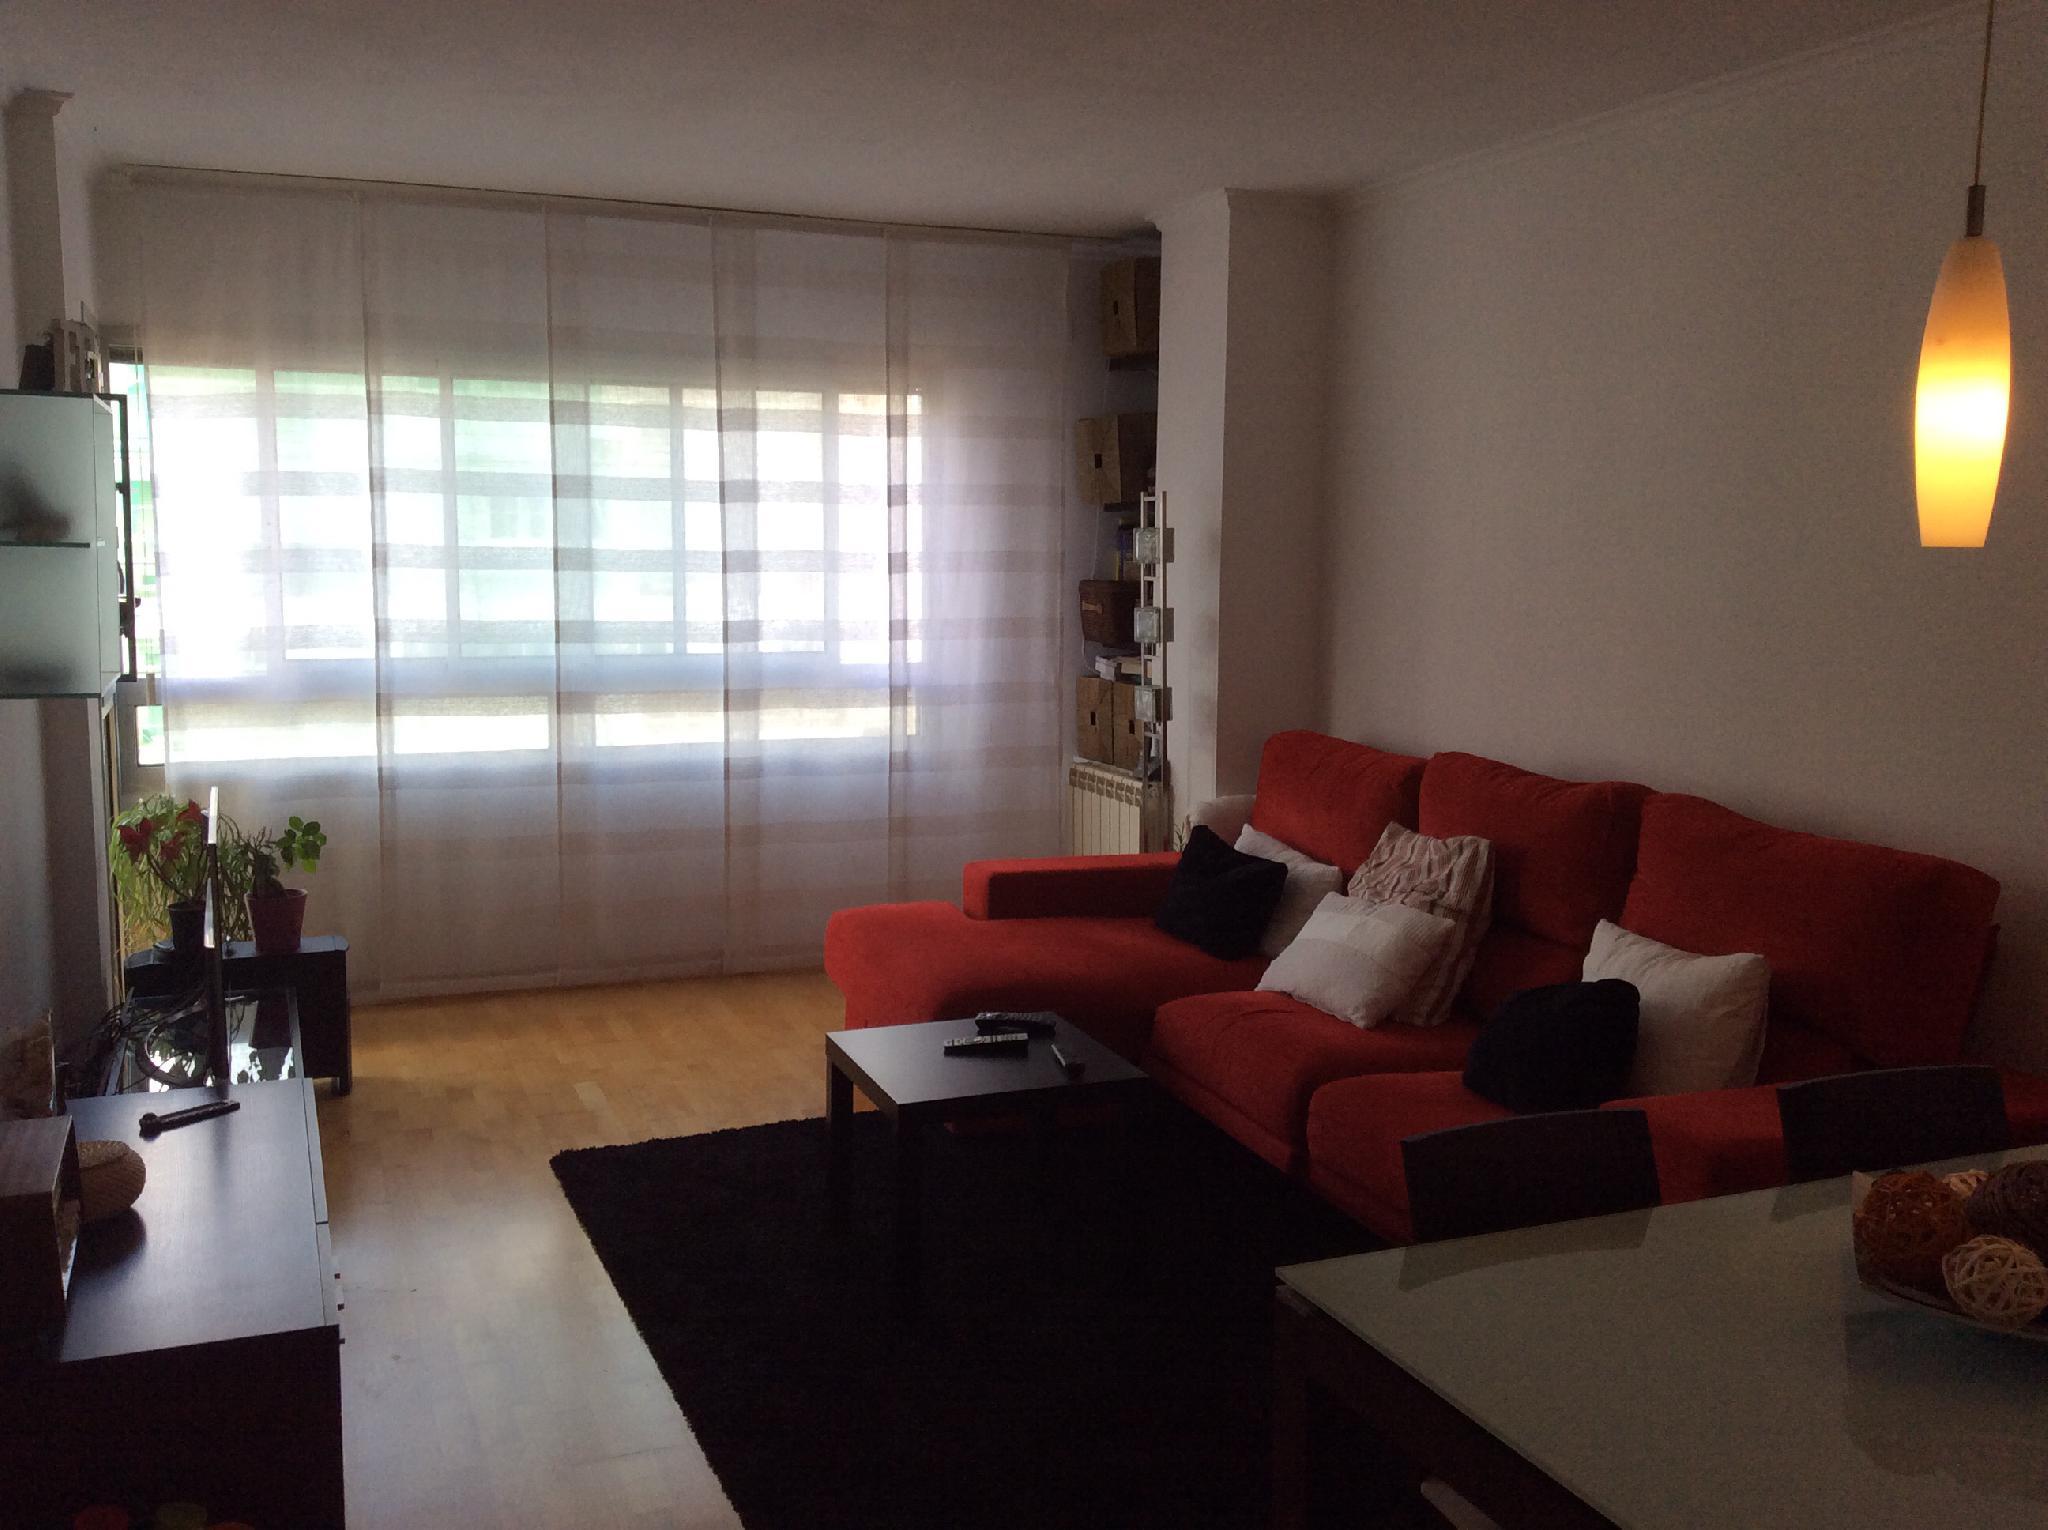 flat-for-sale-in-junto-feria-de-barcelona-la-marina-de-port-in-barcelona